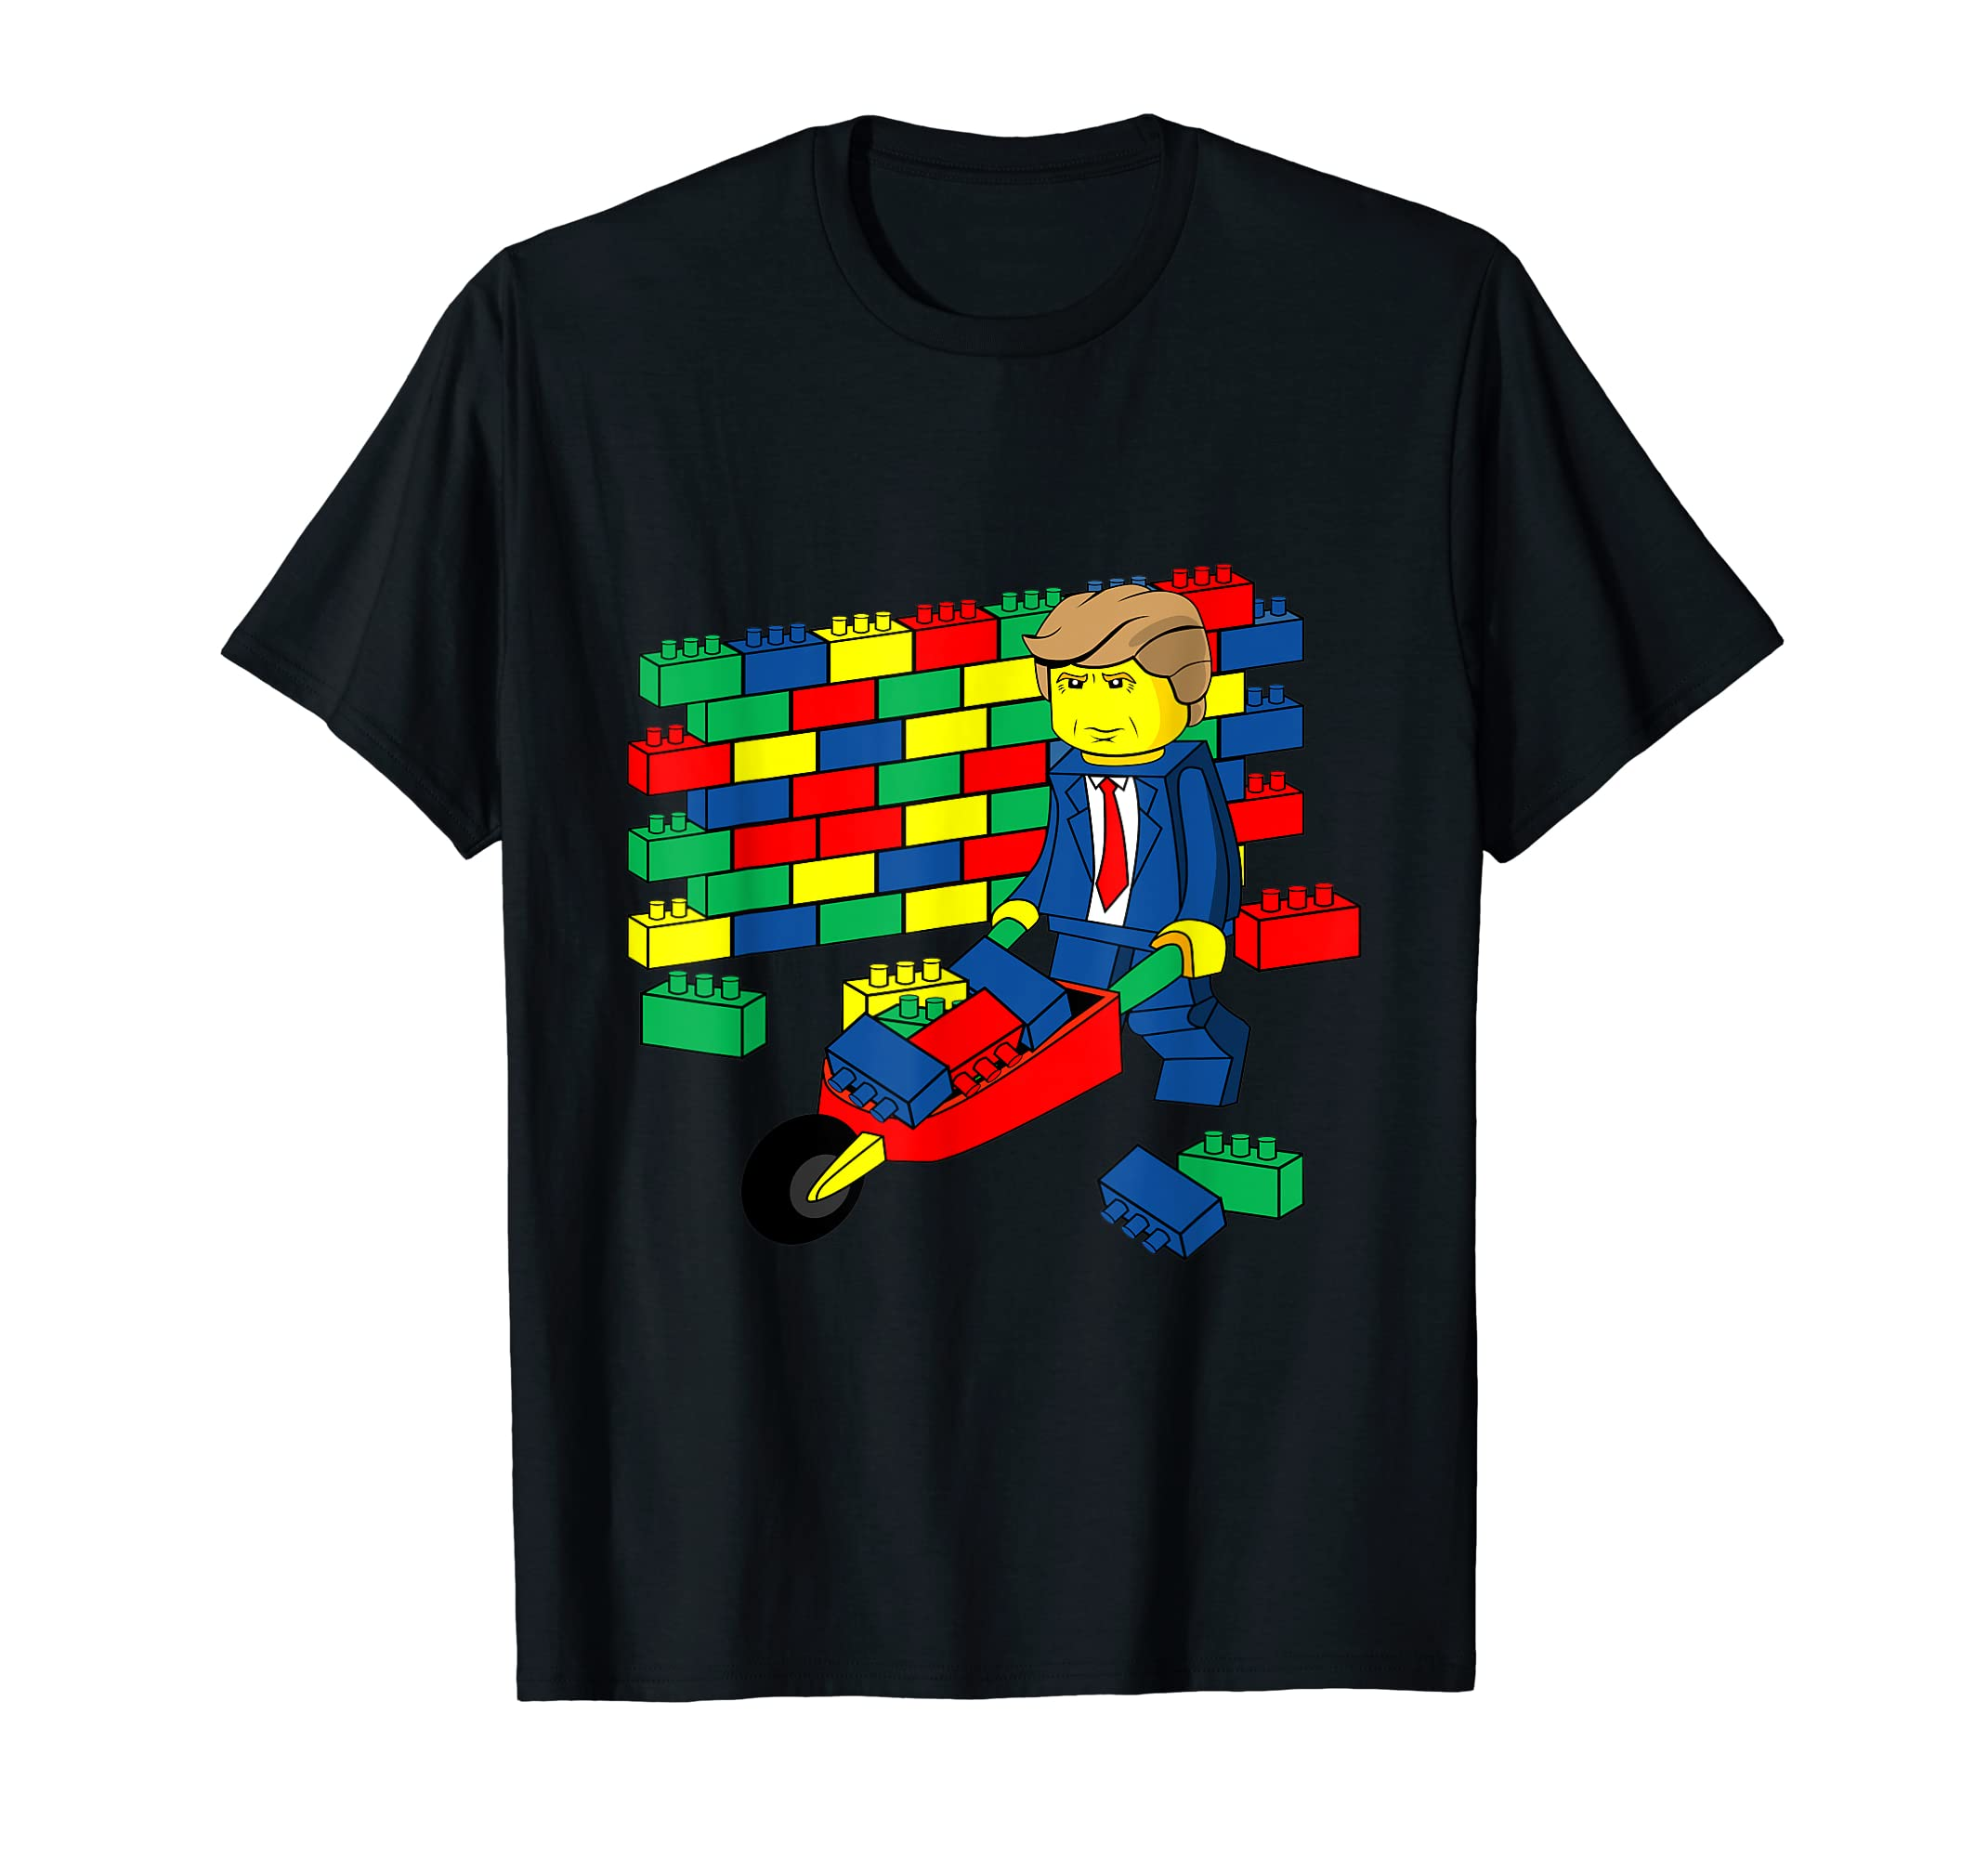 a842703e07b Amazon.com  Donald Trump - Build Wall T-Shirt  Clothing